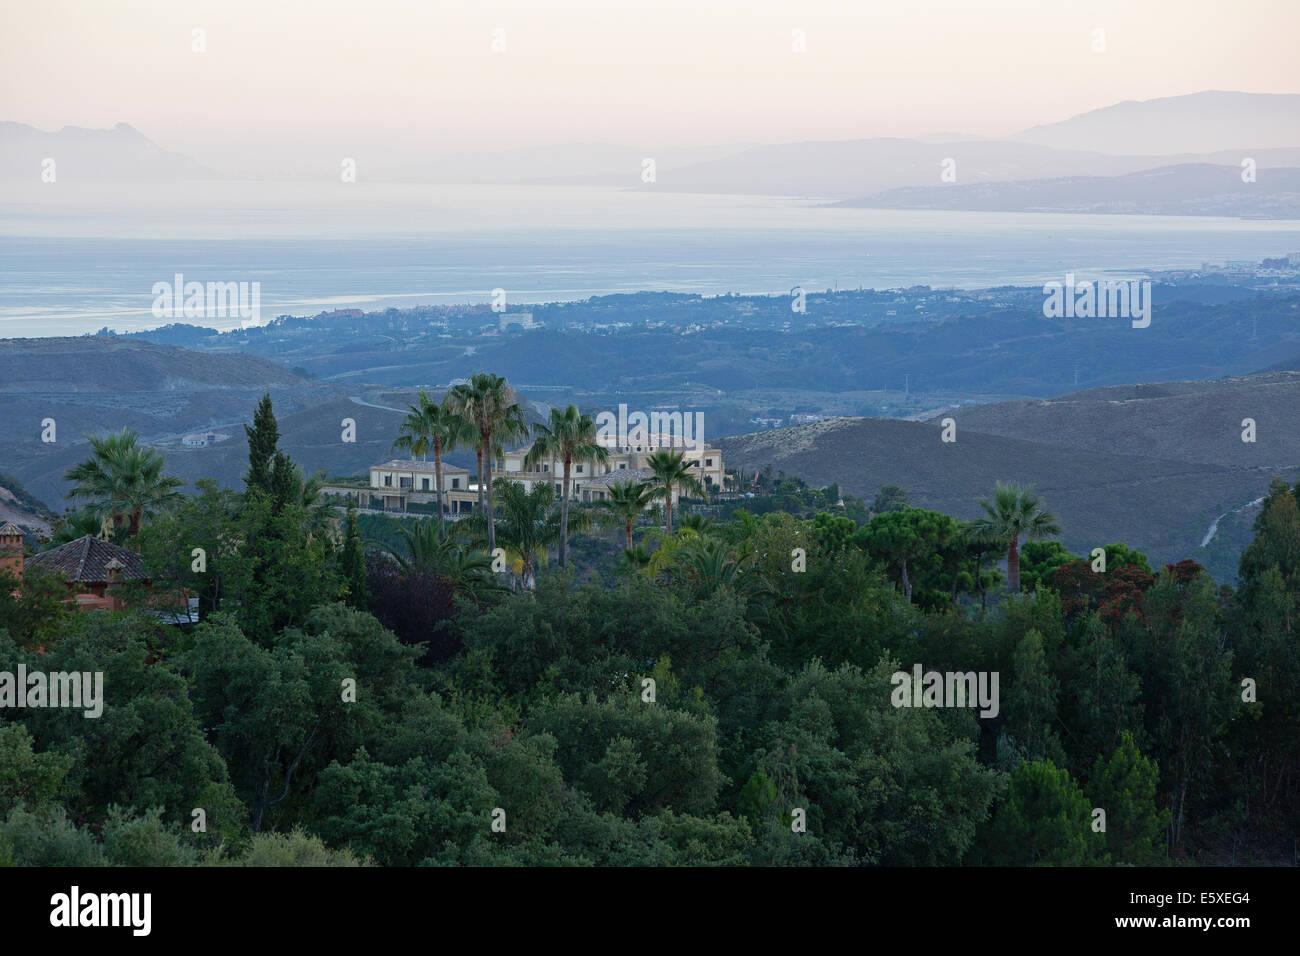 Large Villa built on flattened hilltop in the exclusive luxury mountain retreat of La Zagaleta - Stock Image